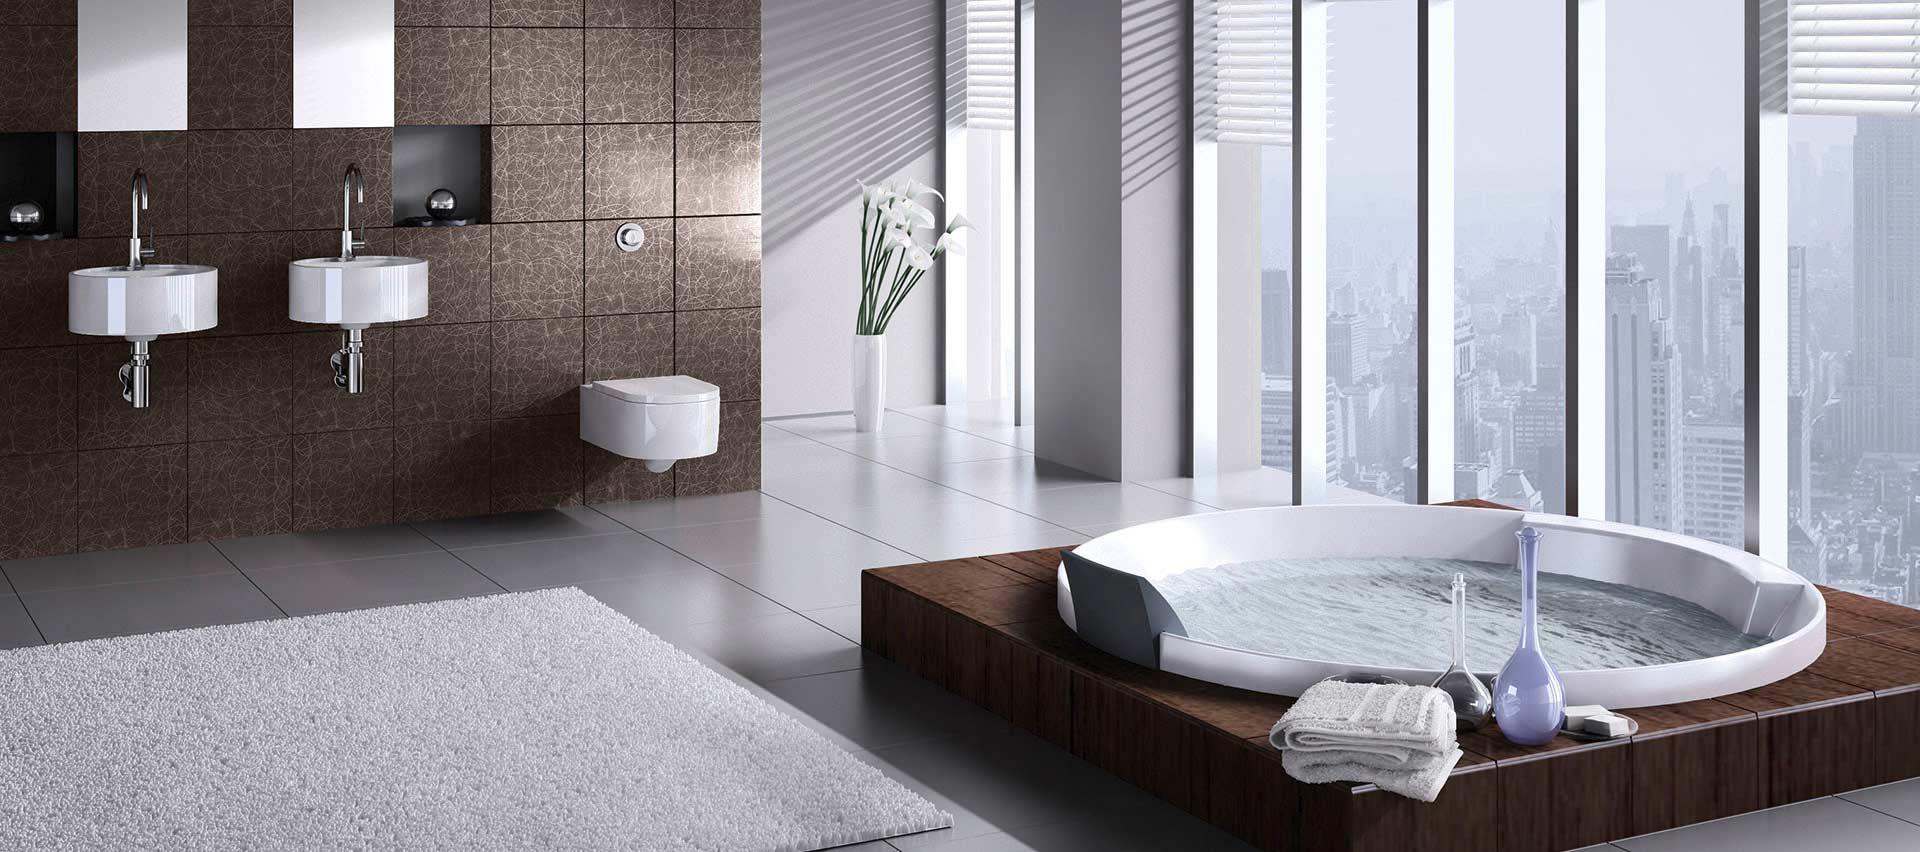 Schichtstoffplatten im Bad bei Holz-Hauff in Leingarten